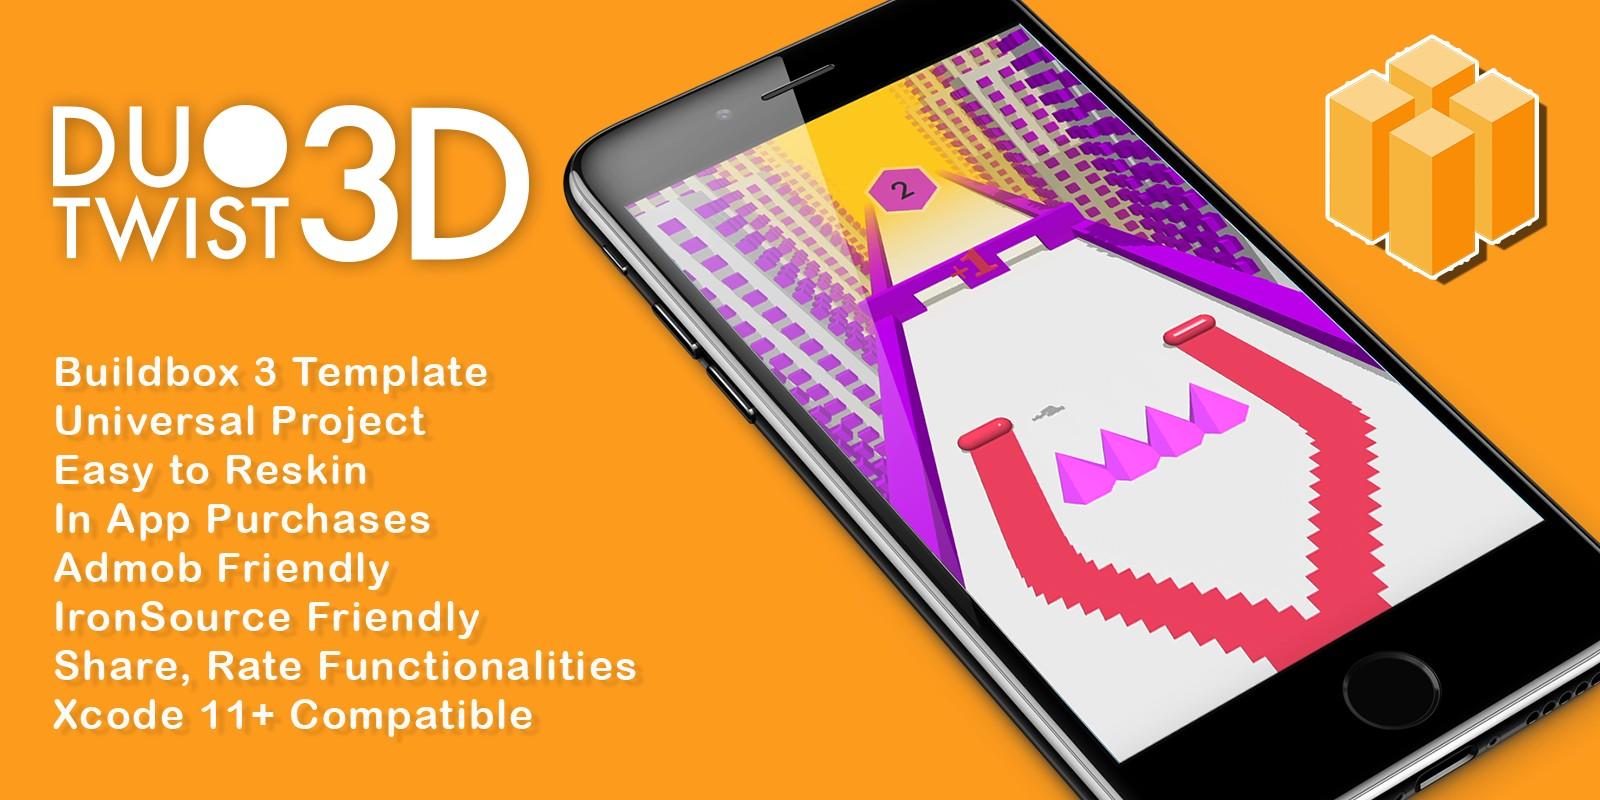 Duo Twist 3D - Buildbox 3 Template